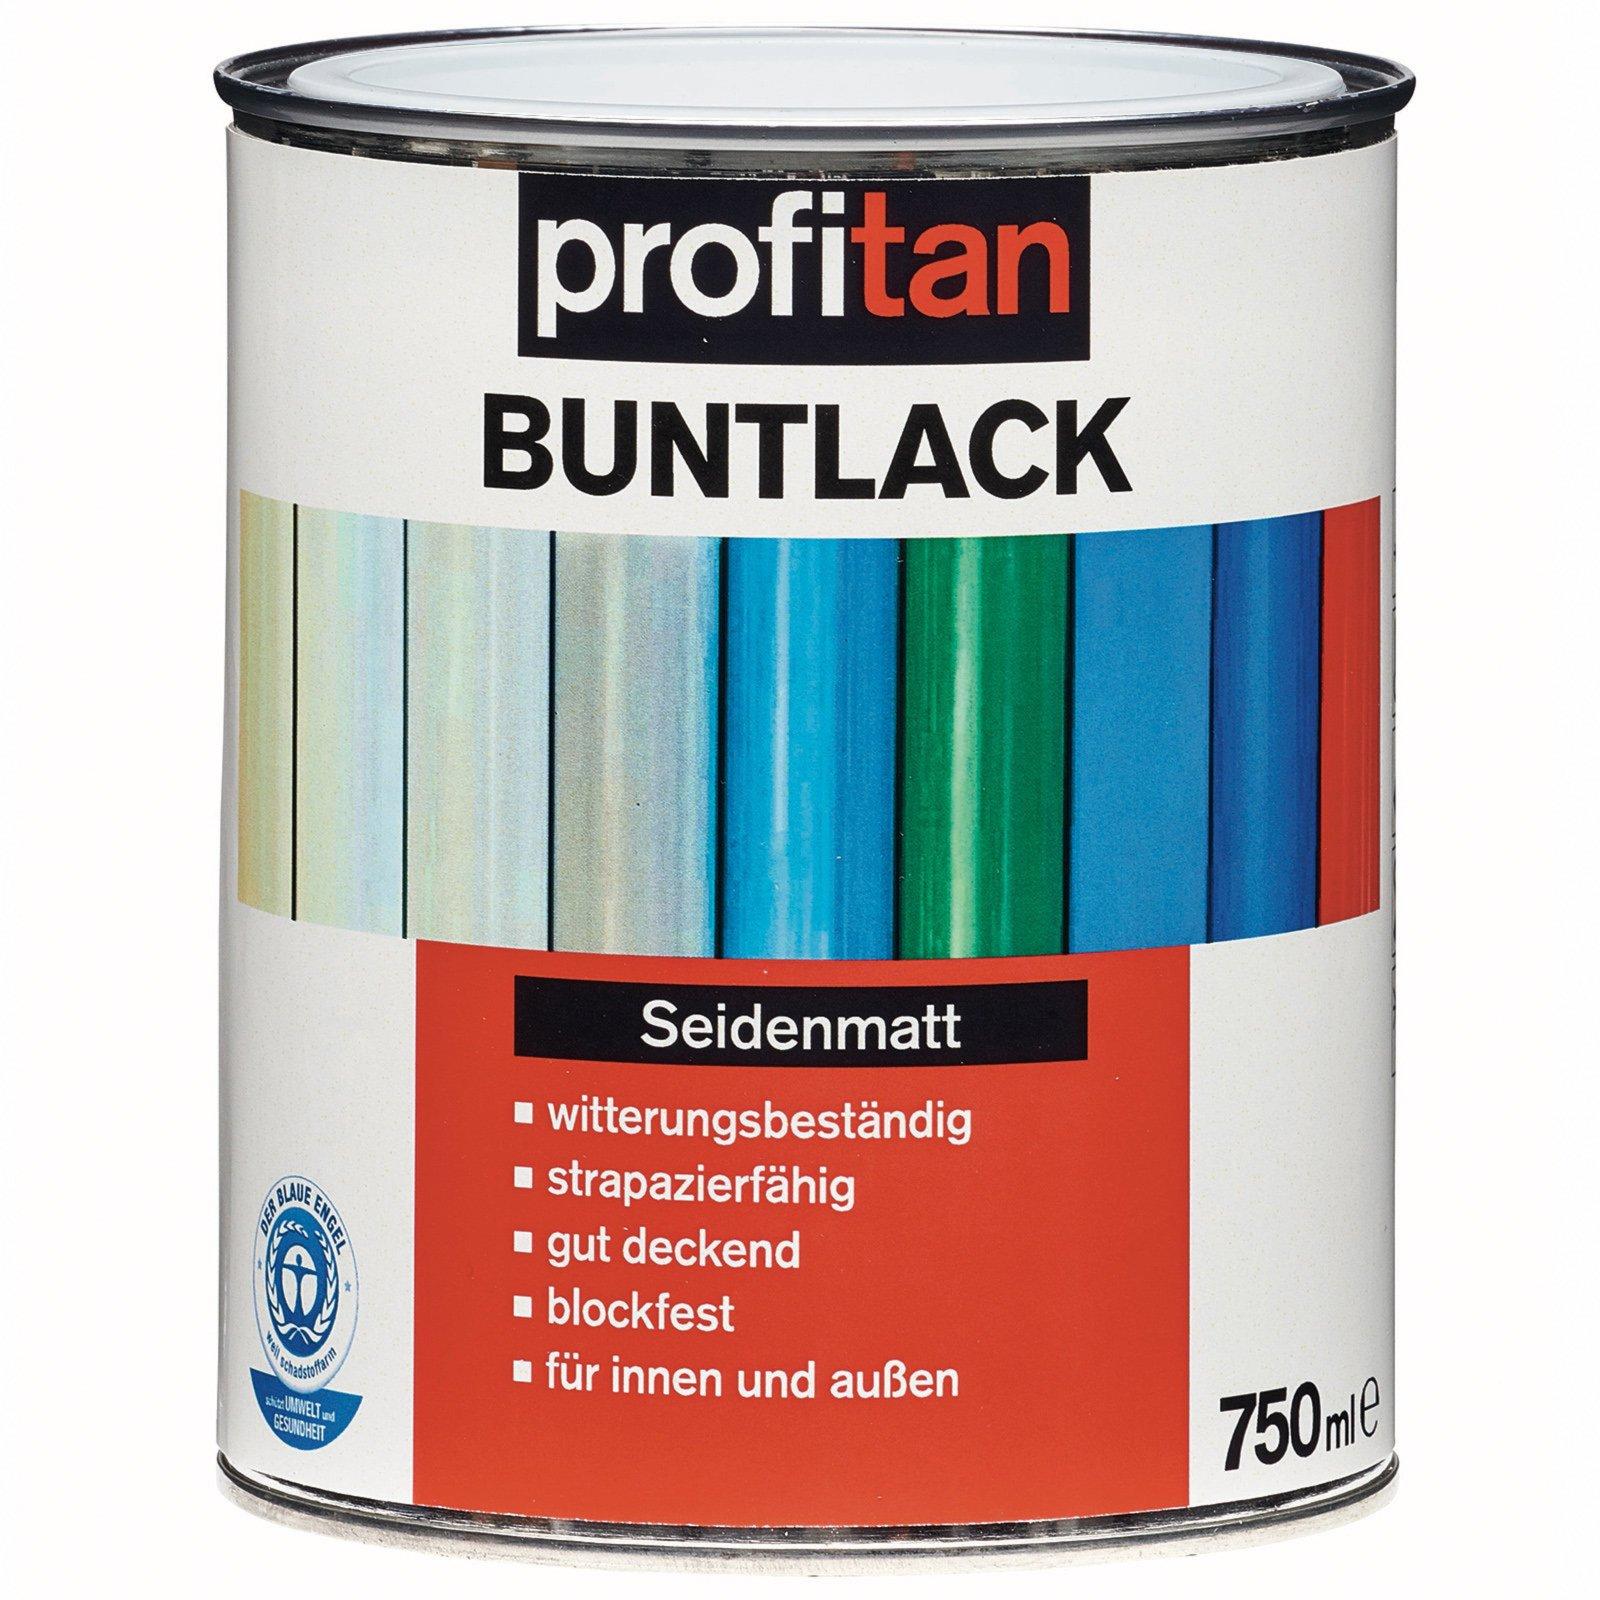 profitan Buntlack - reinweiß seidenmatt - 750 ml